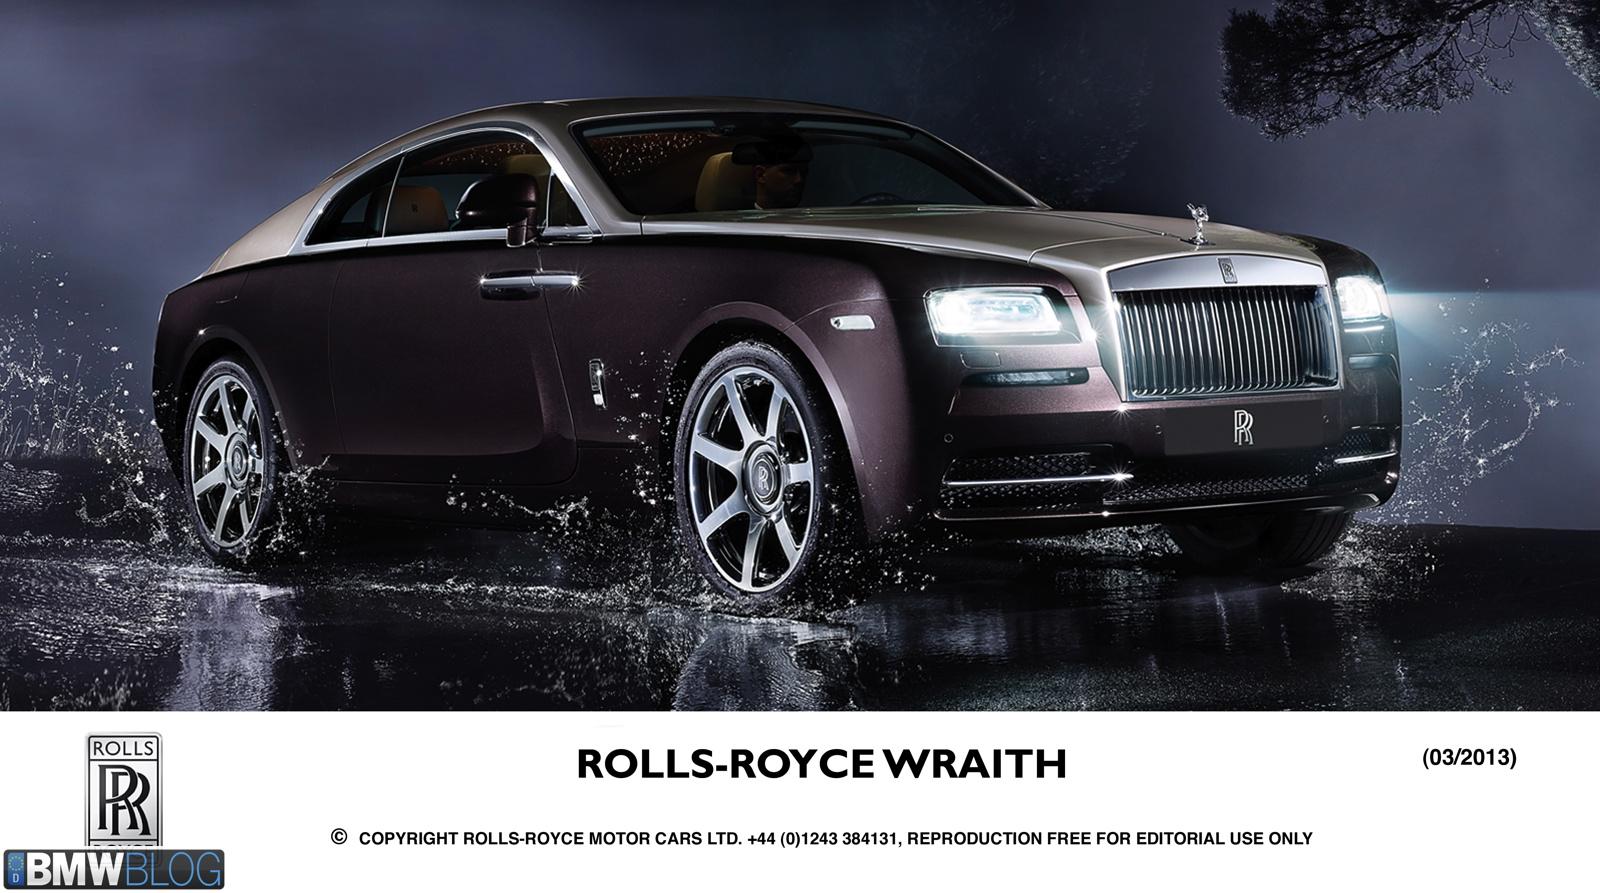 Rolls Royce Wraith 0 60 >> Rolls Royce Wraith 0 60 Upcoming New Car Release 2020